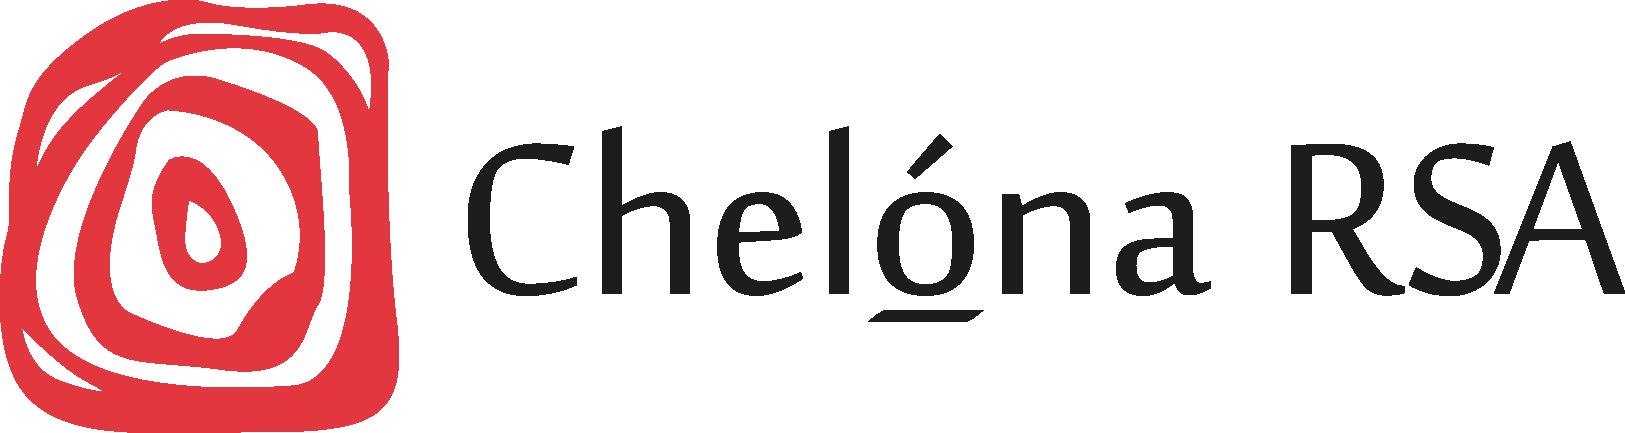 Chelona RSA